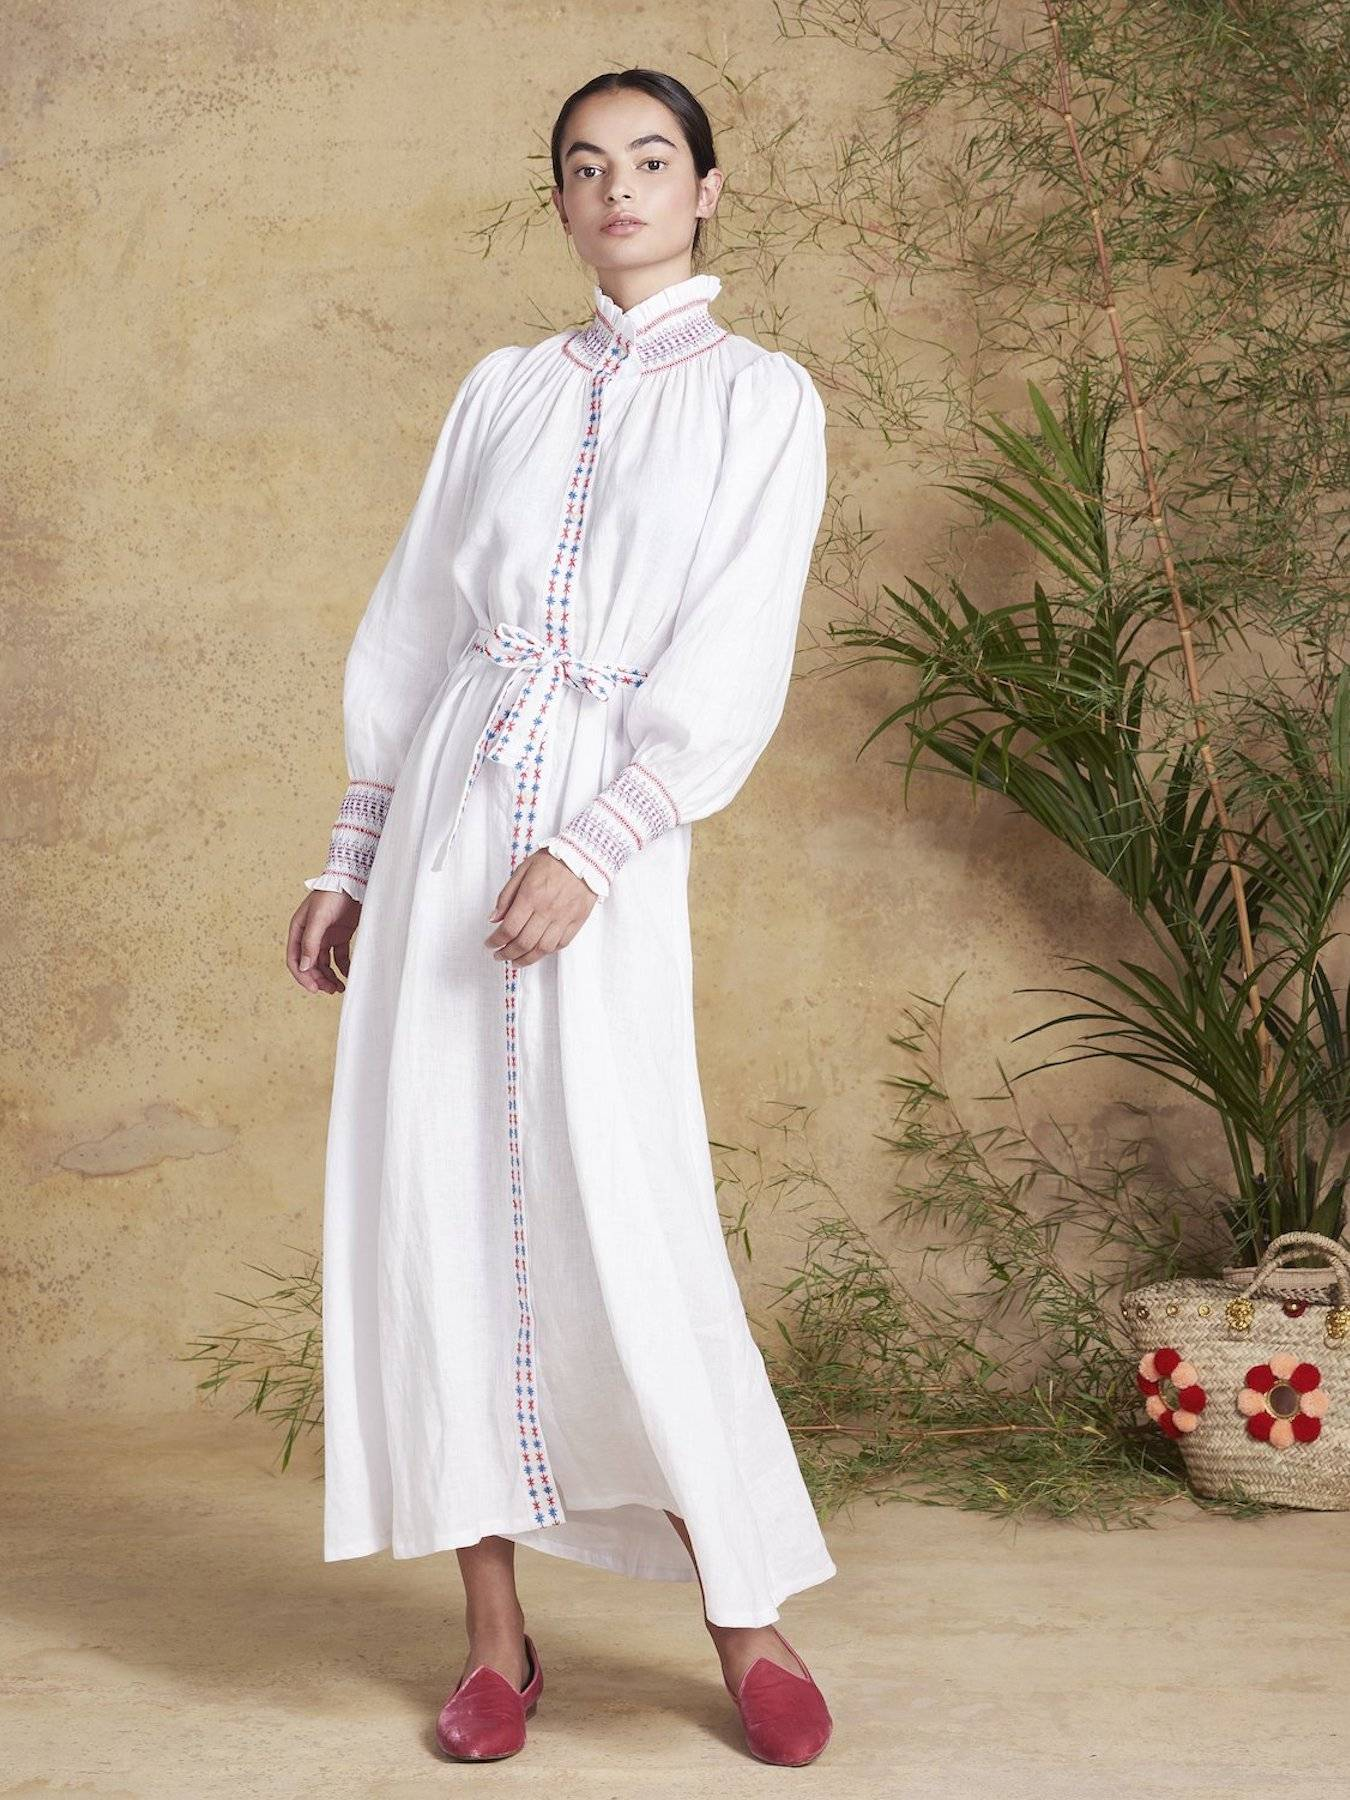 Purchase with Purpose Muzungu Sisters Sustainable Handmade Alice Dress